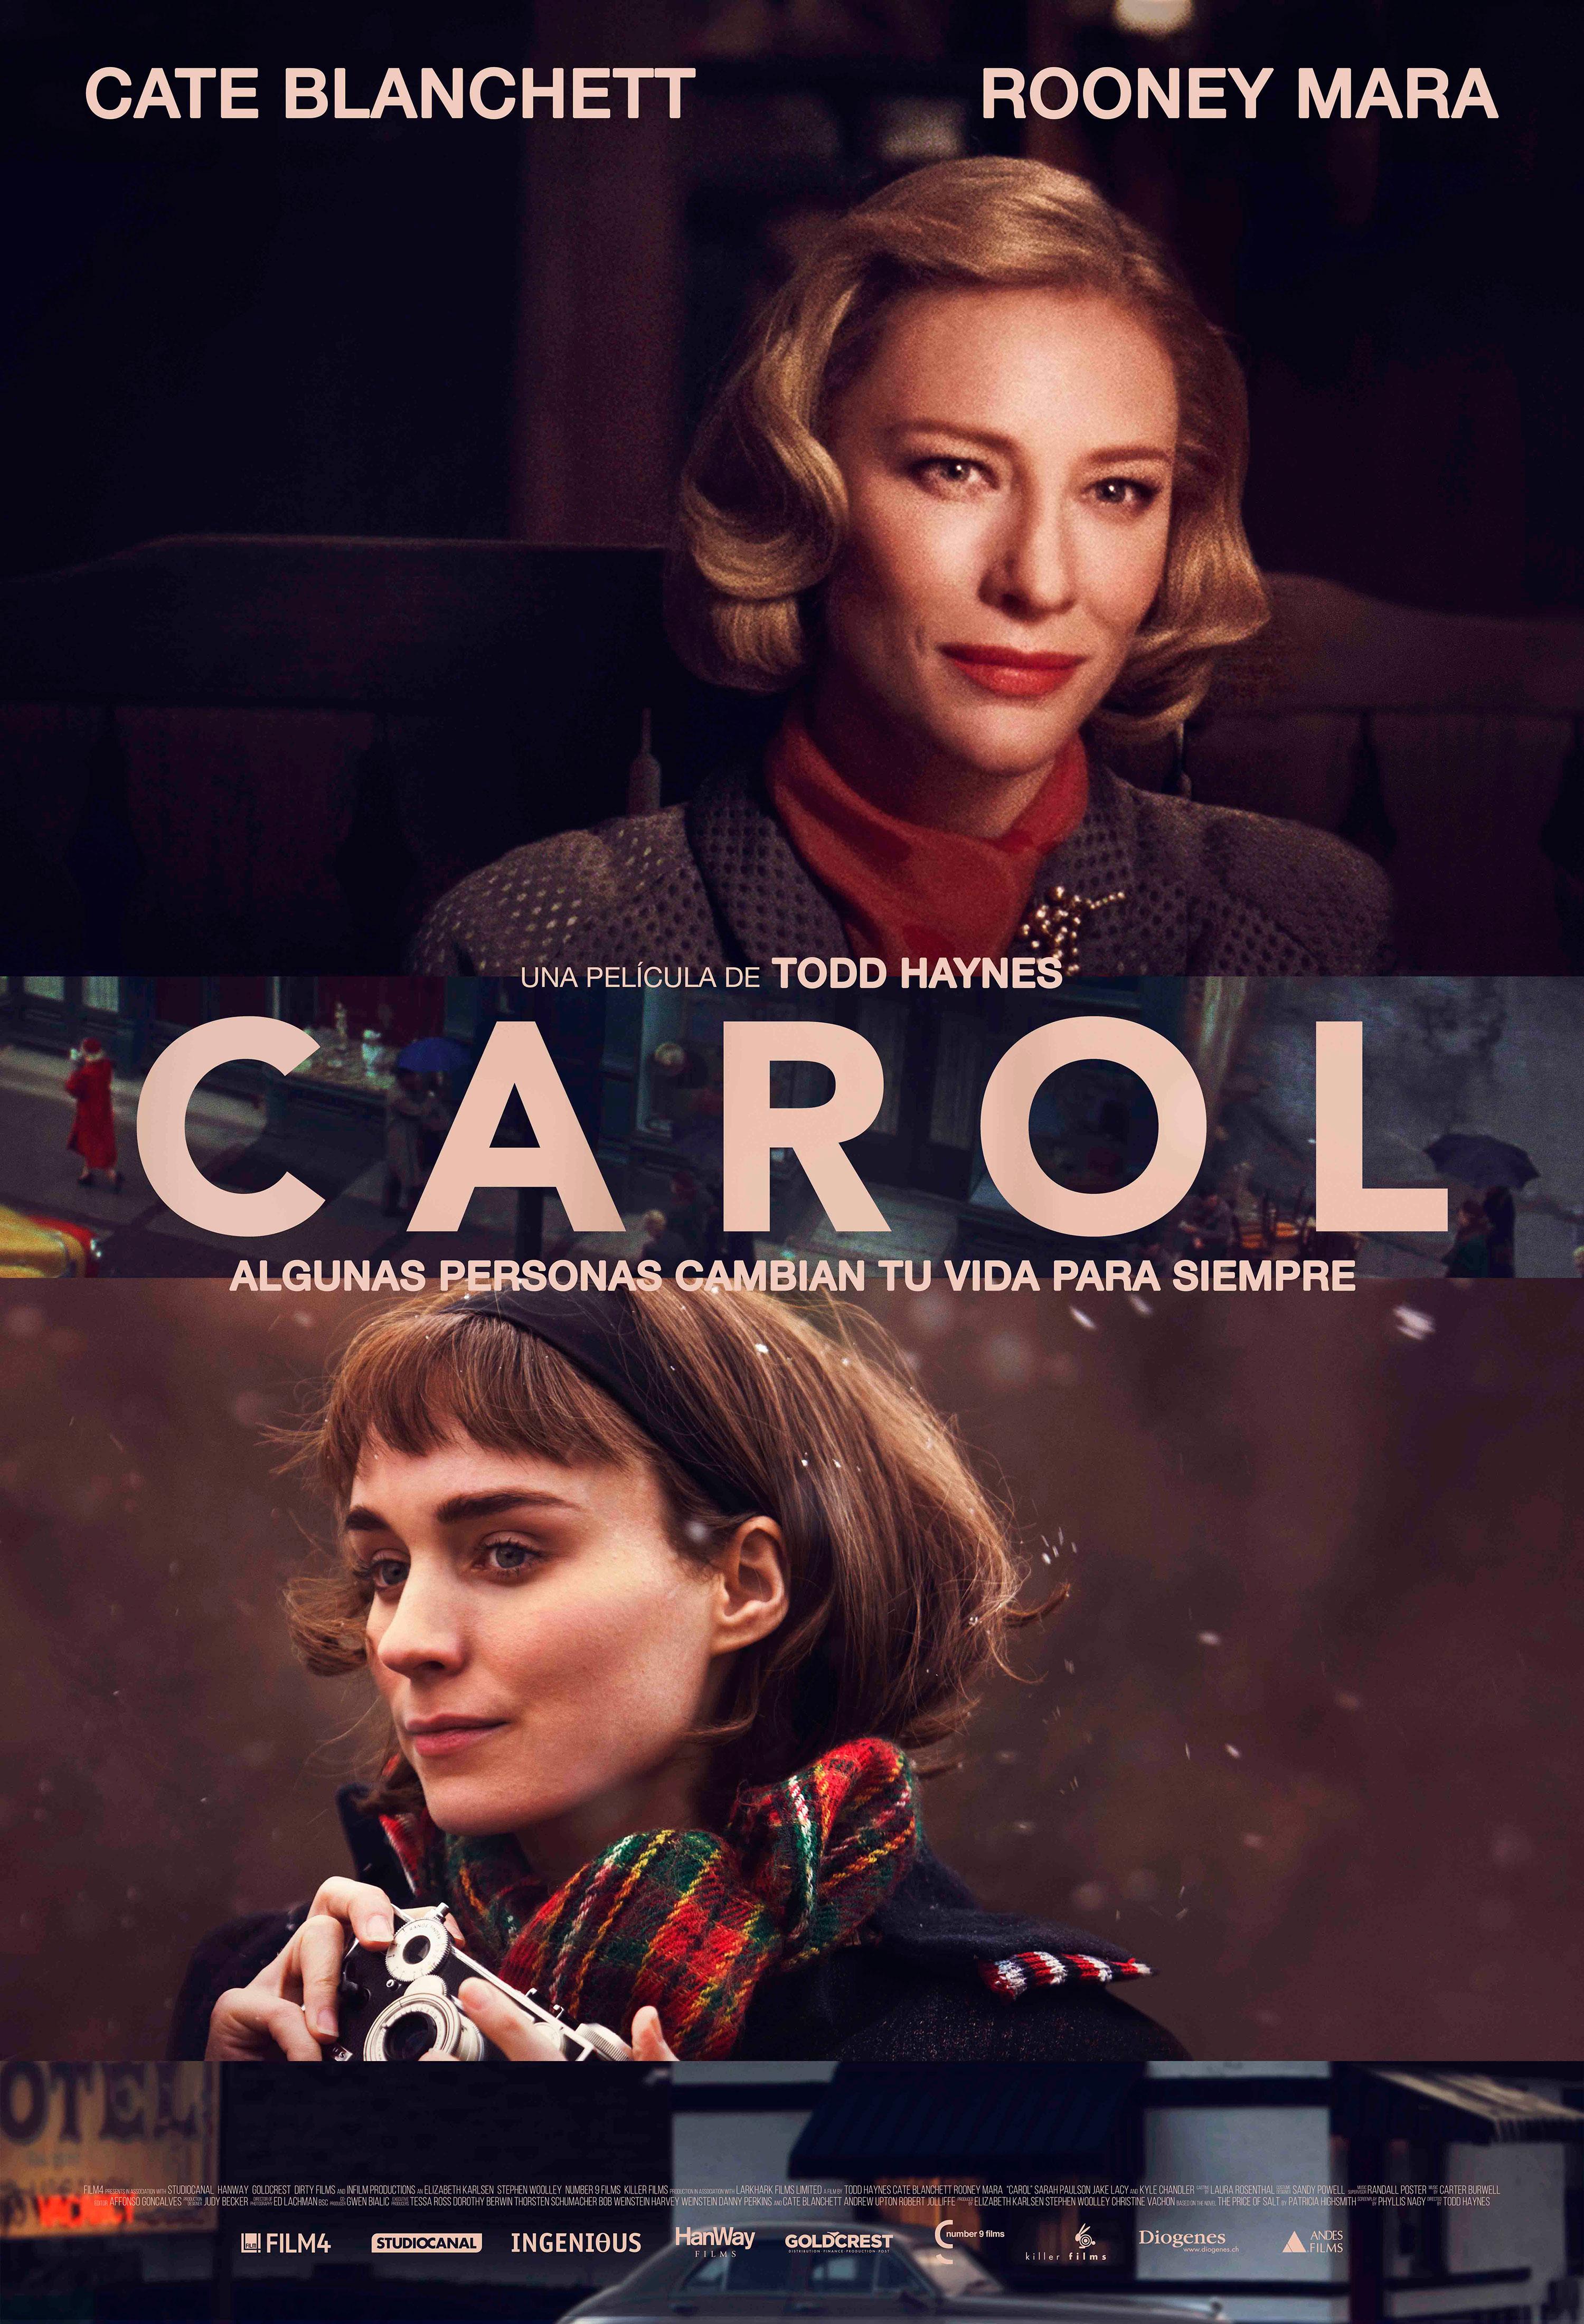 http://www.andesfilms.com.pe/carol-2016/